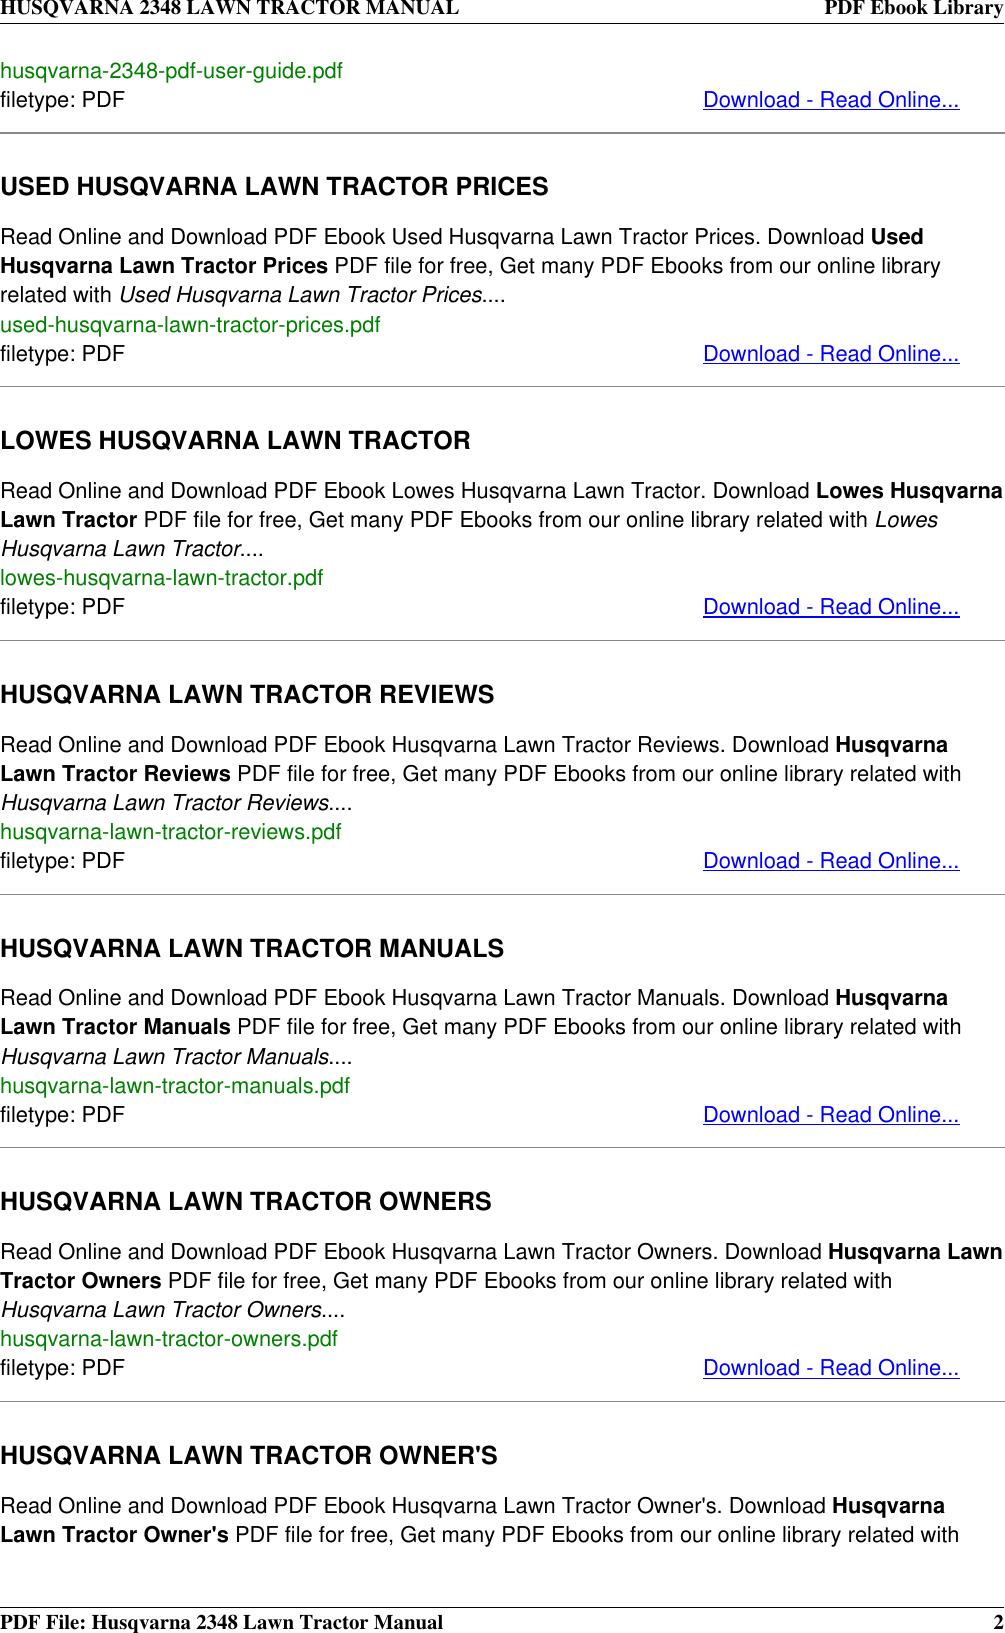 Husqvarna manuals ebook 22 philips gc4411 manual array husqvarna lawn mower 2348 users manual tractor rh usermanual wiki fandeluxe Images